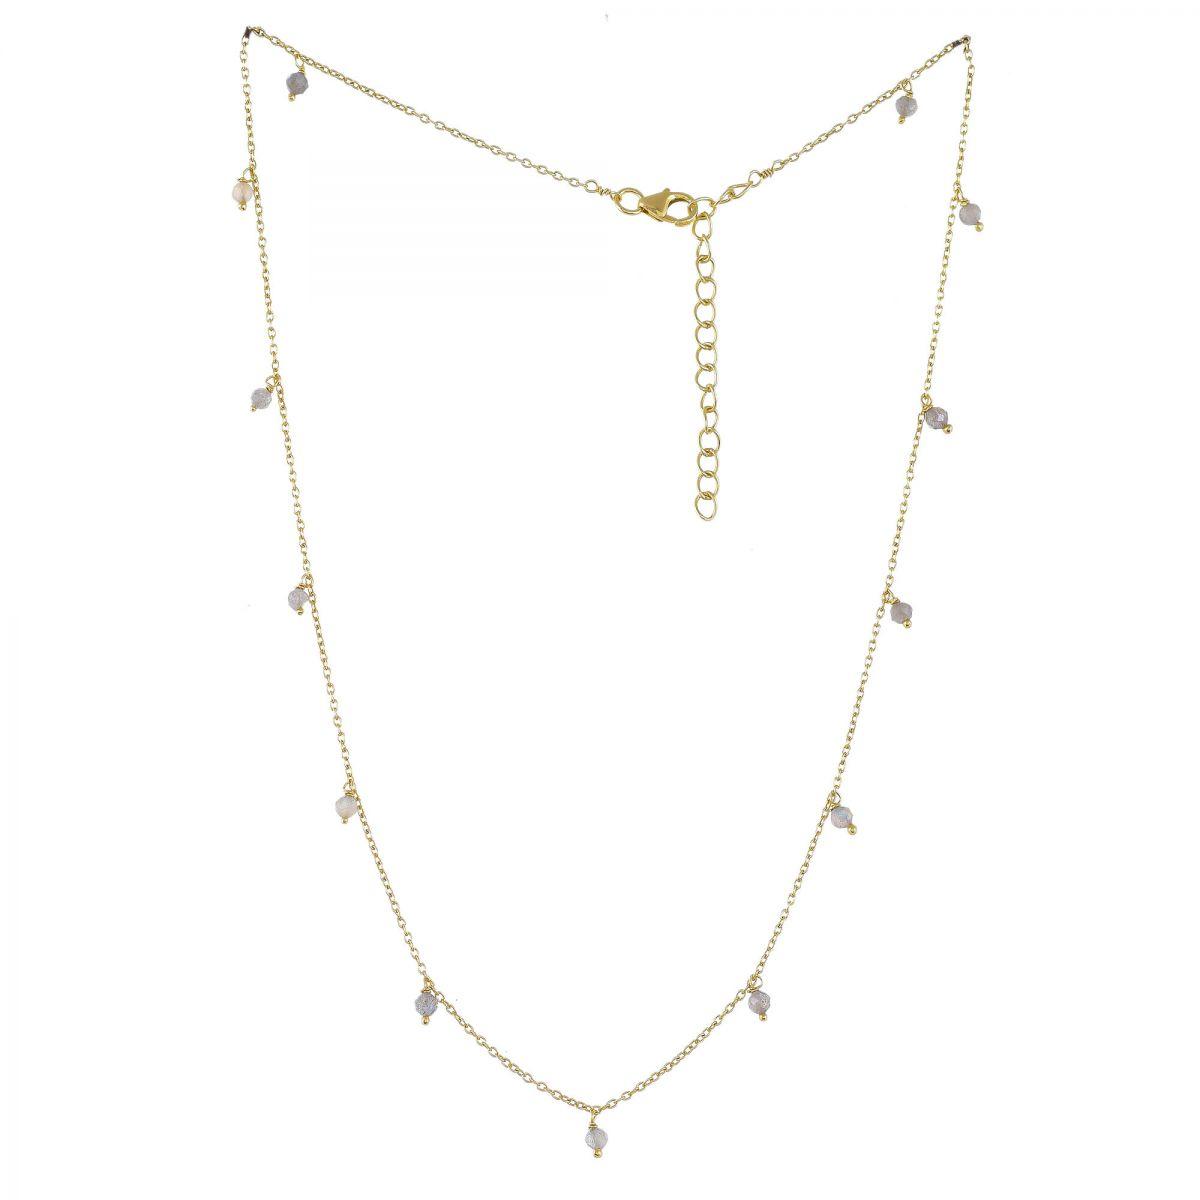 jcollier 3mm labradorite beads 45cm gold plated